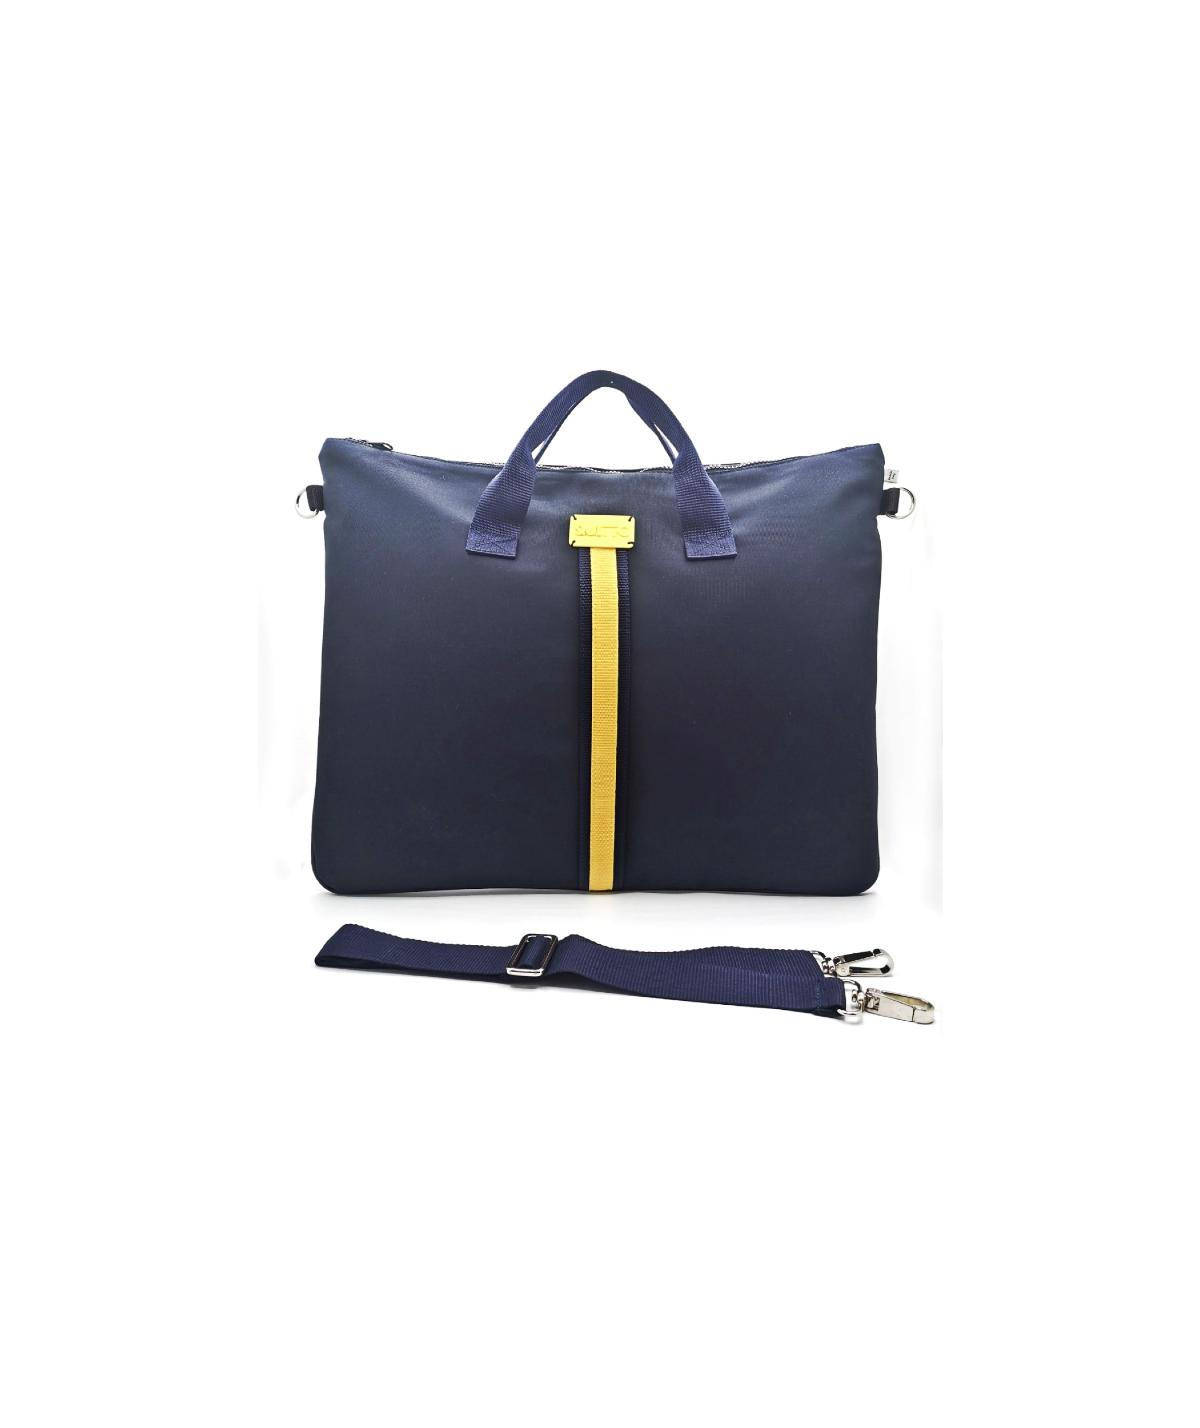 maxi-bag-blu-riga-gialla-davanti